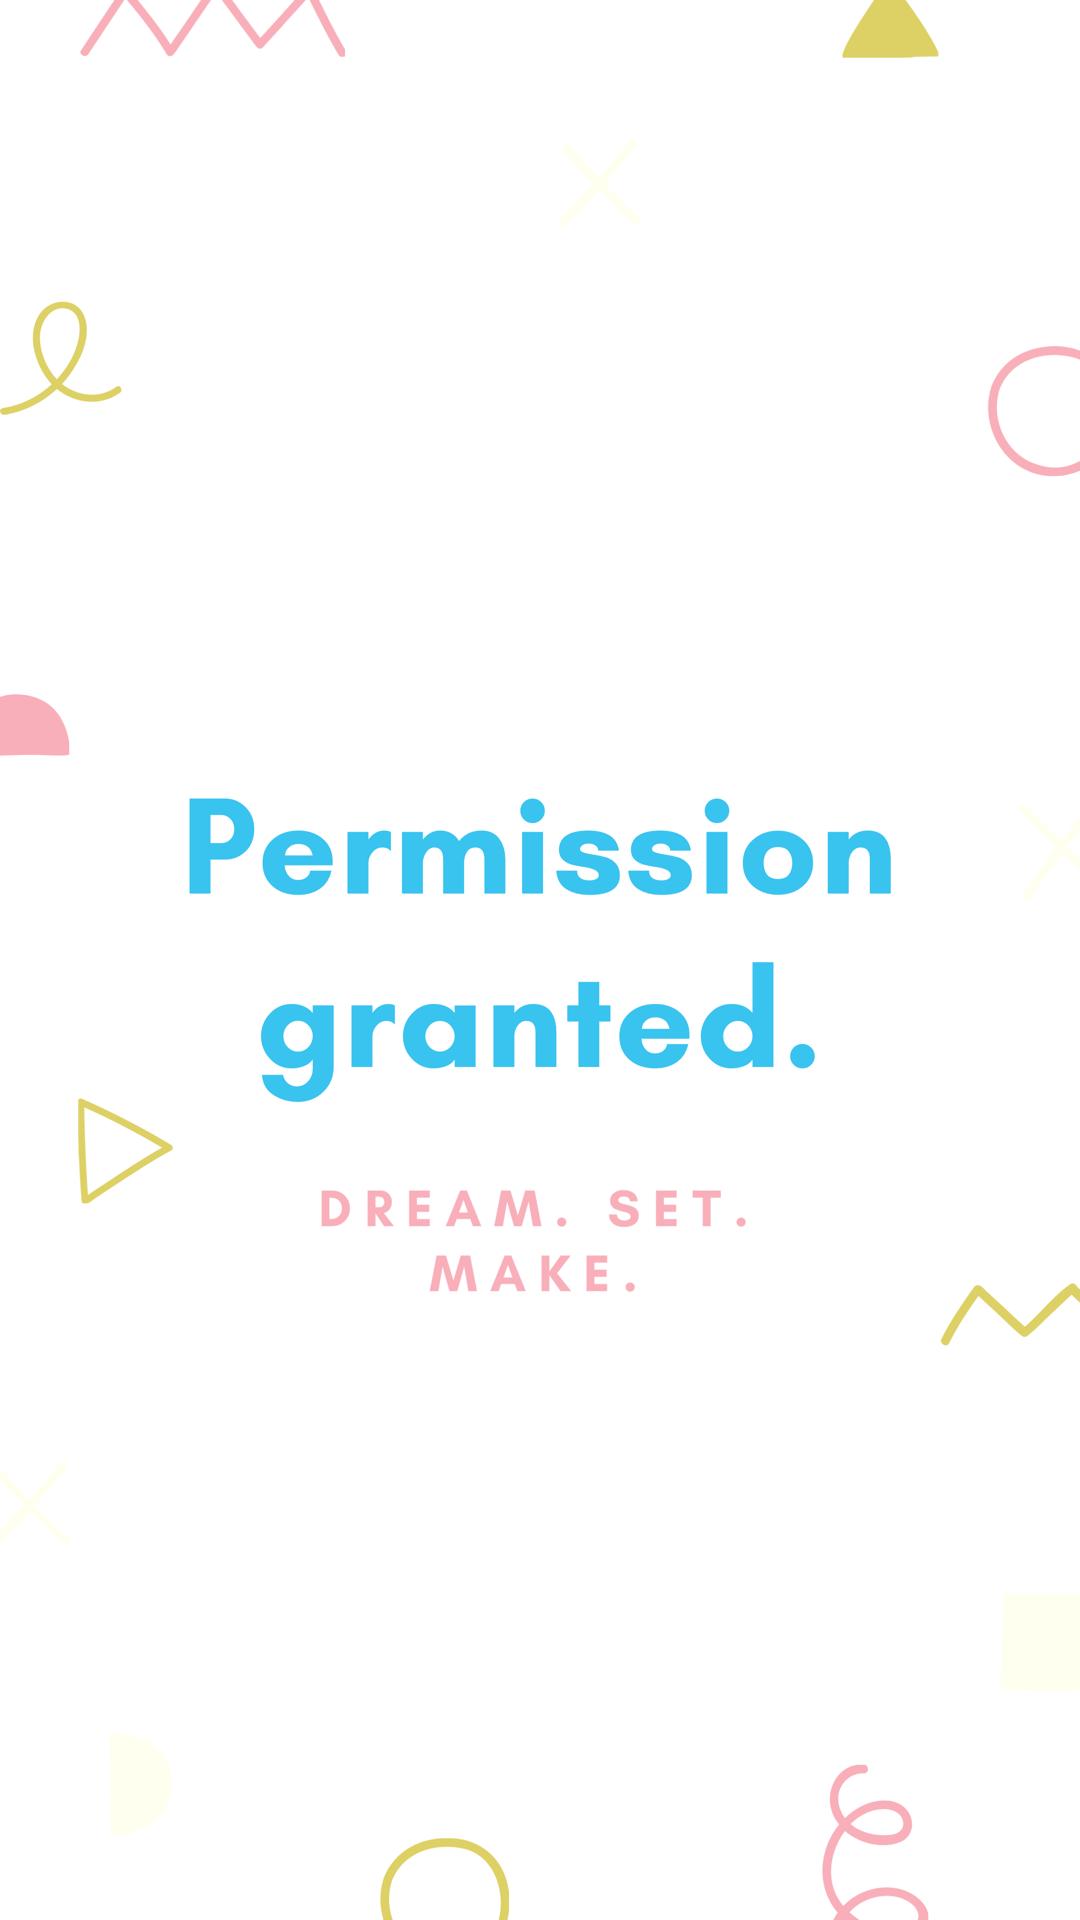 Permission granted.